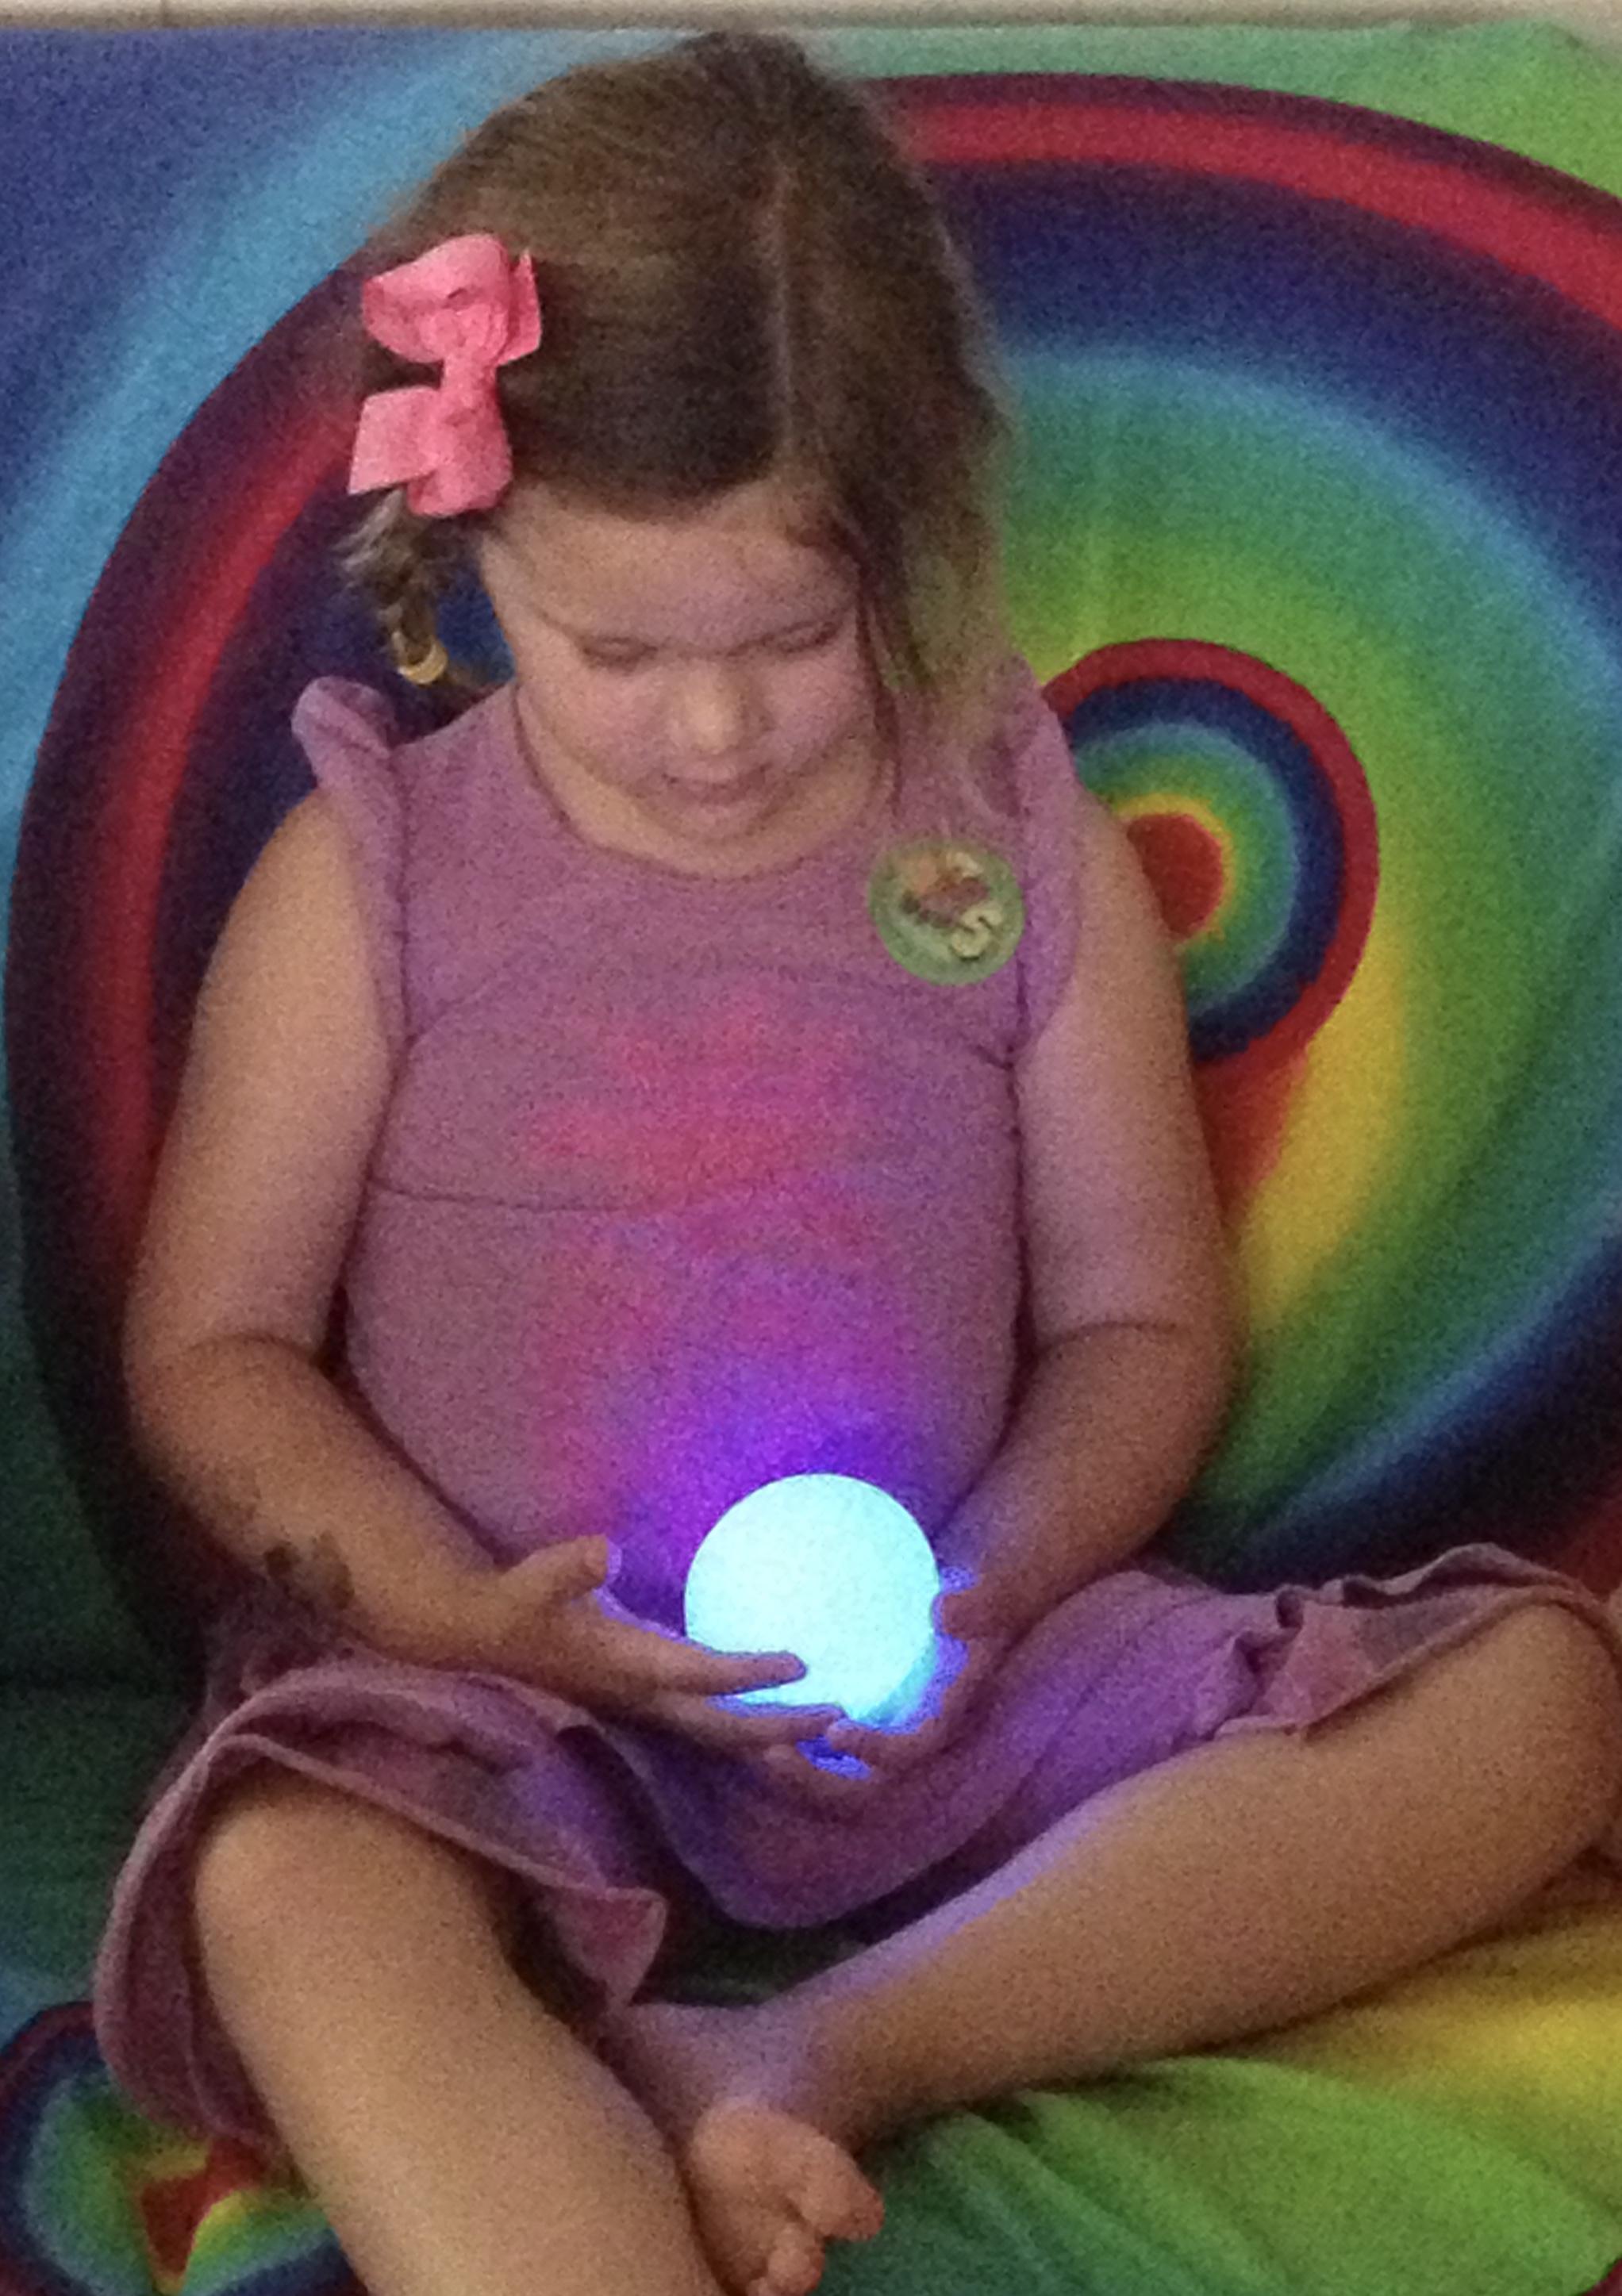 Little girl holding blue glowing magic egg